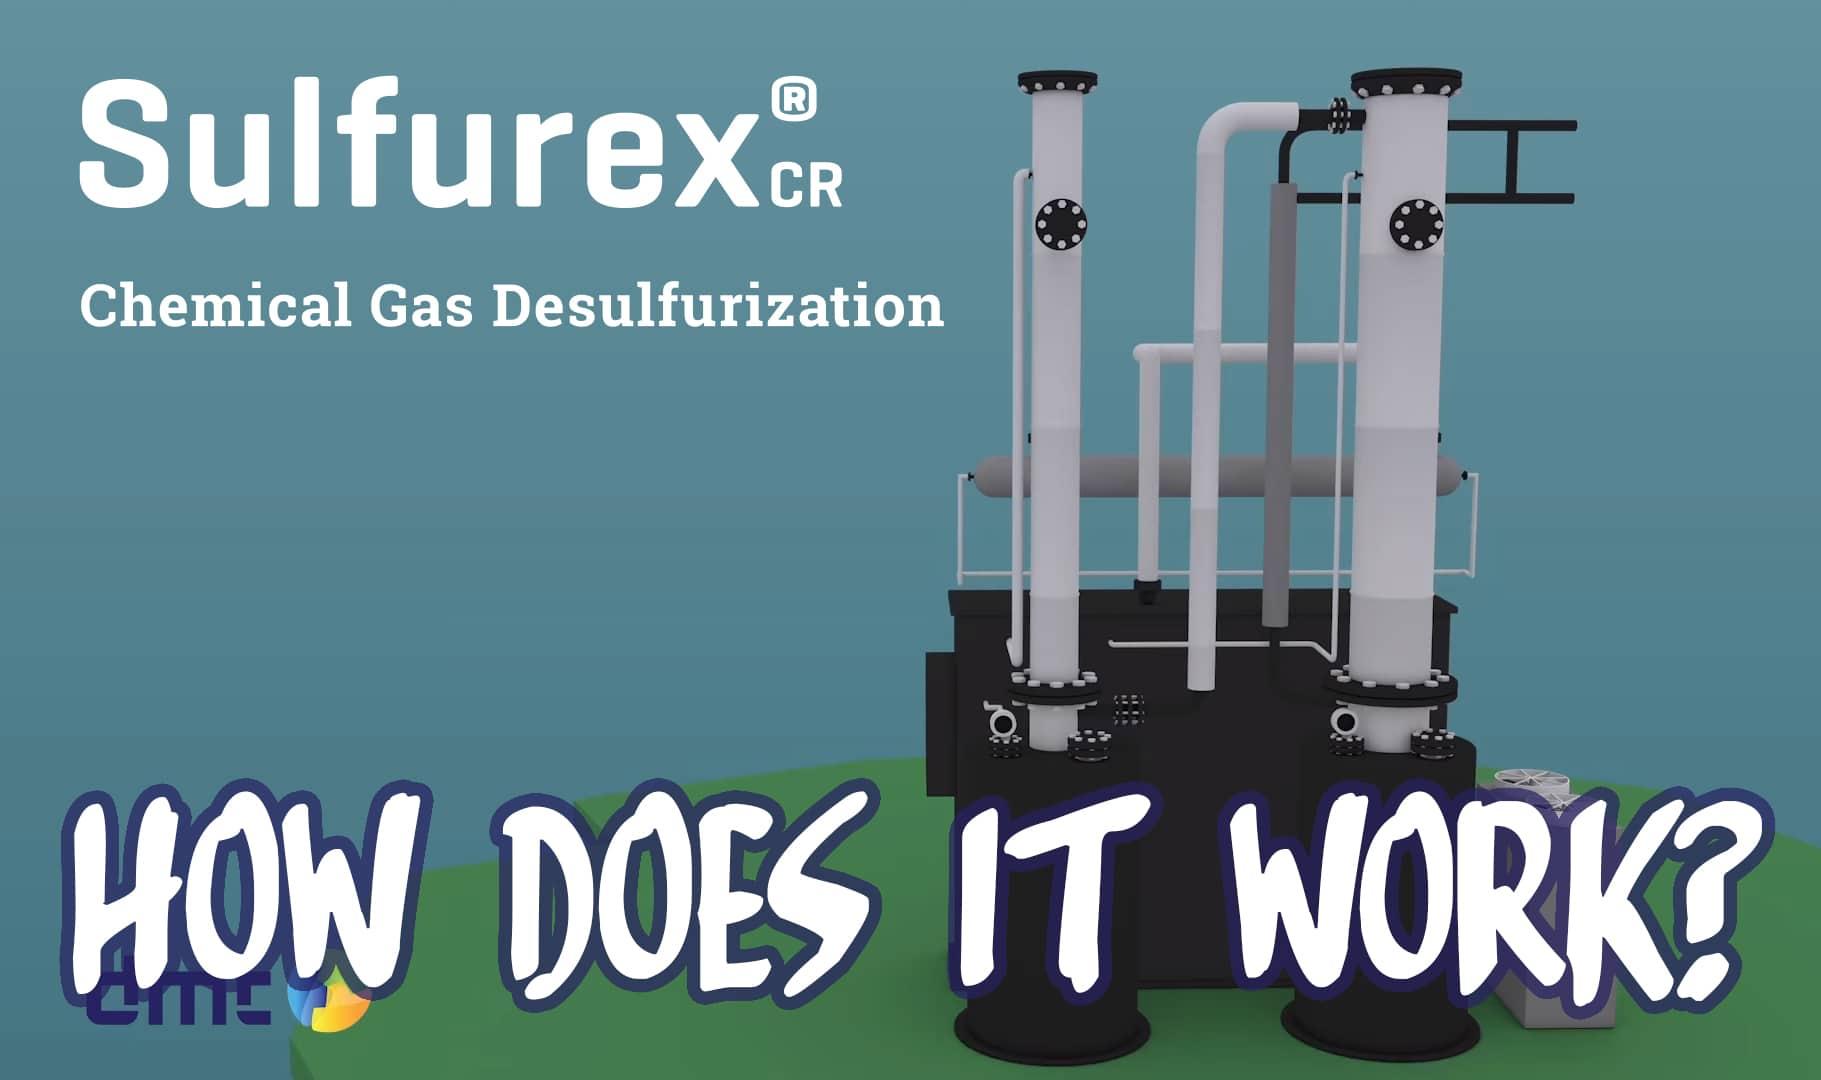 Choose the Sulfurex® CR.